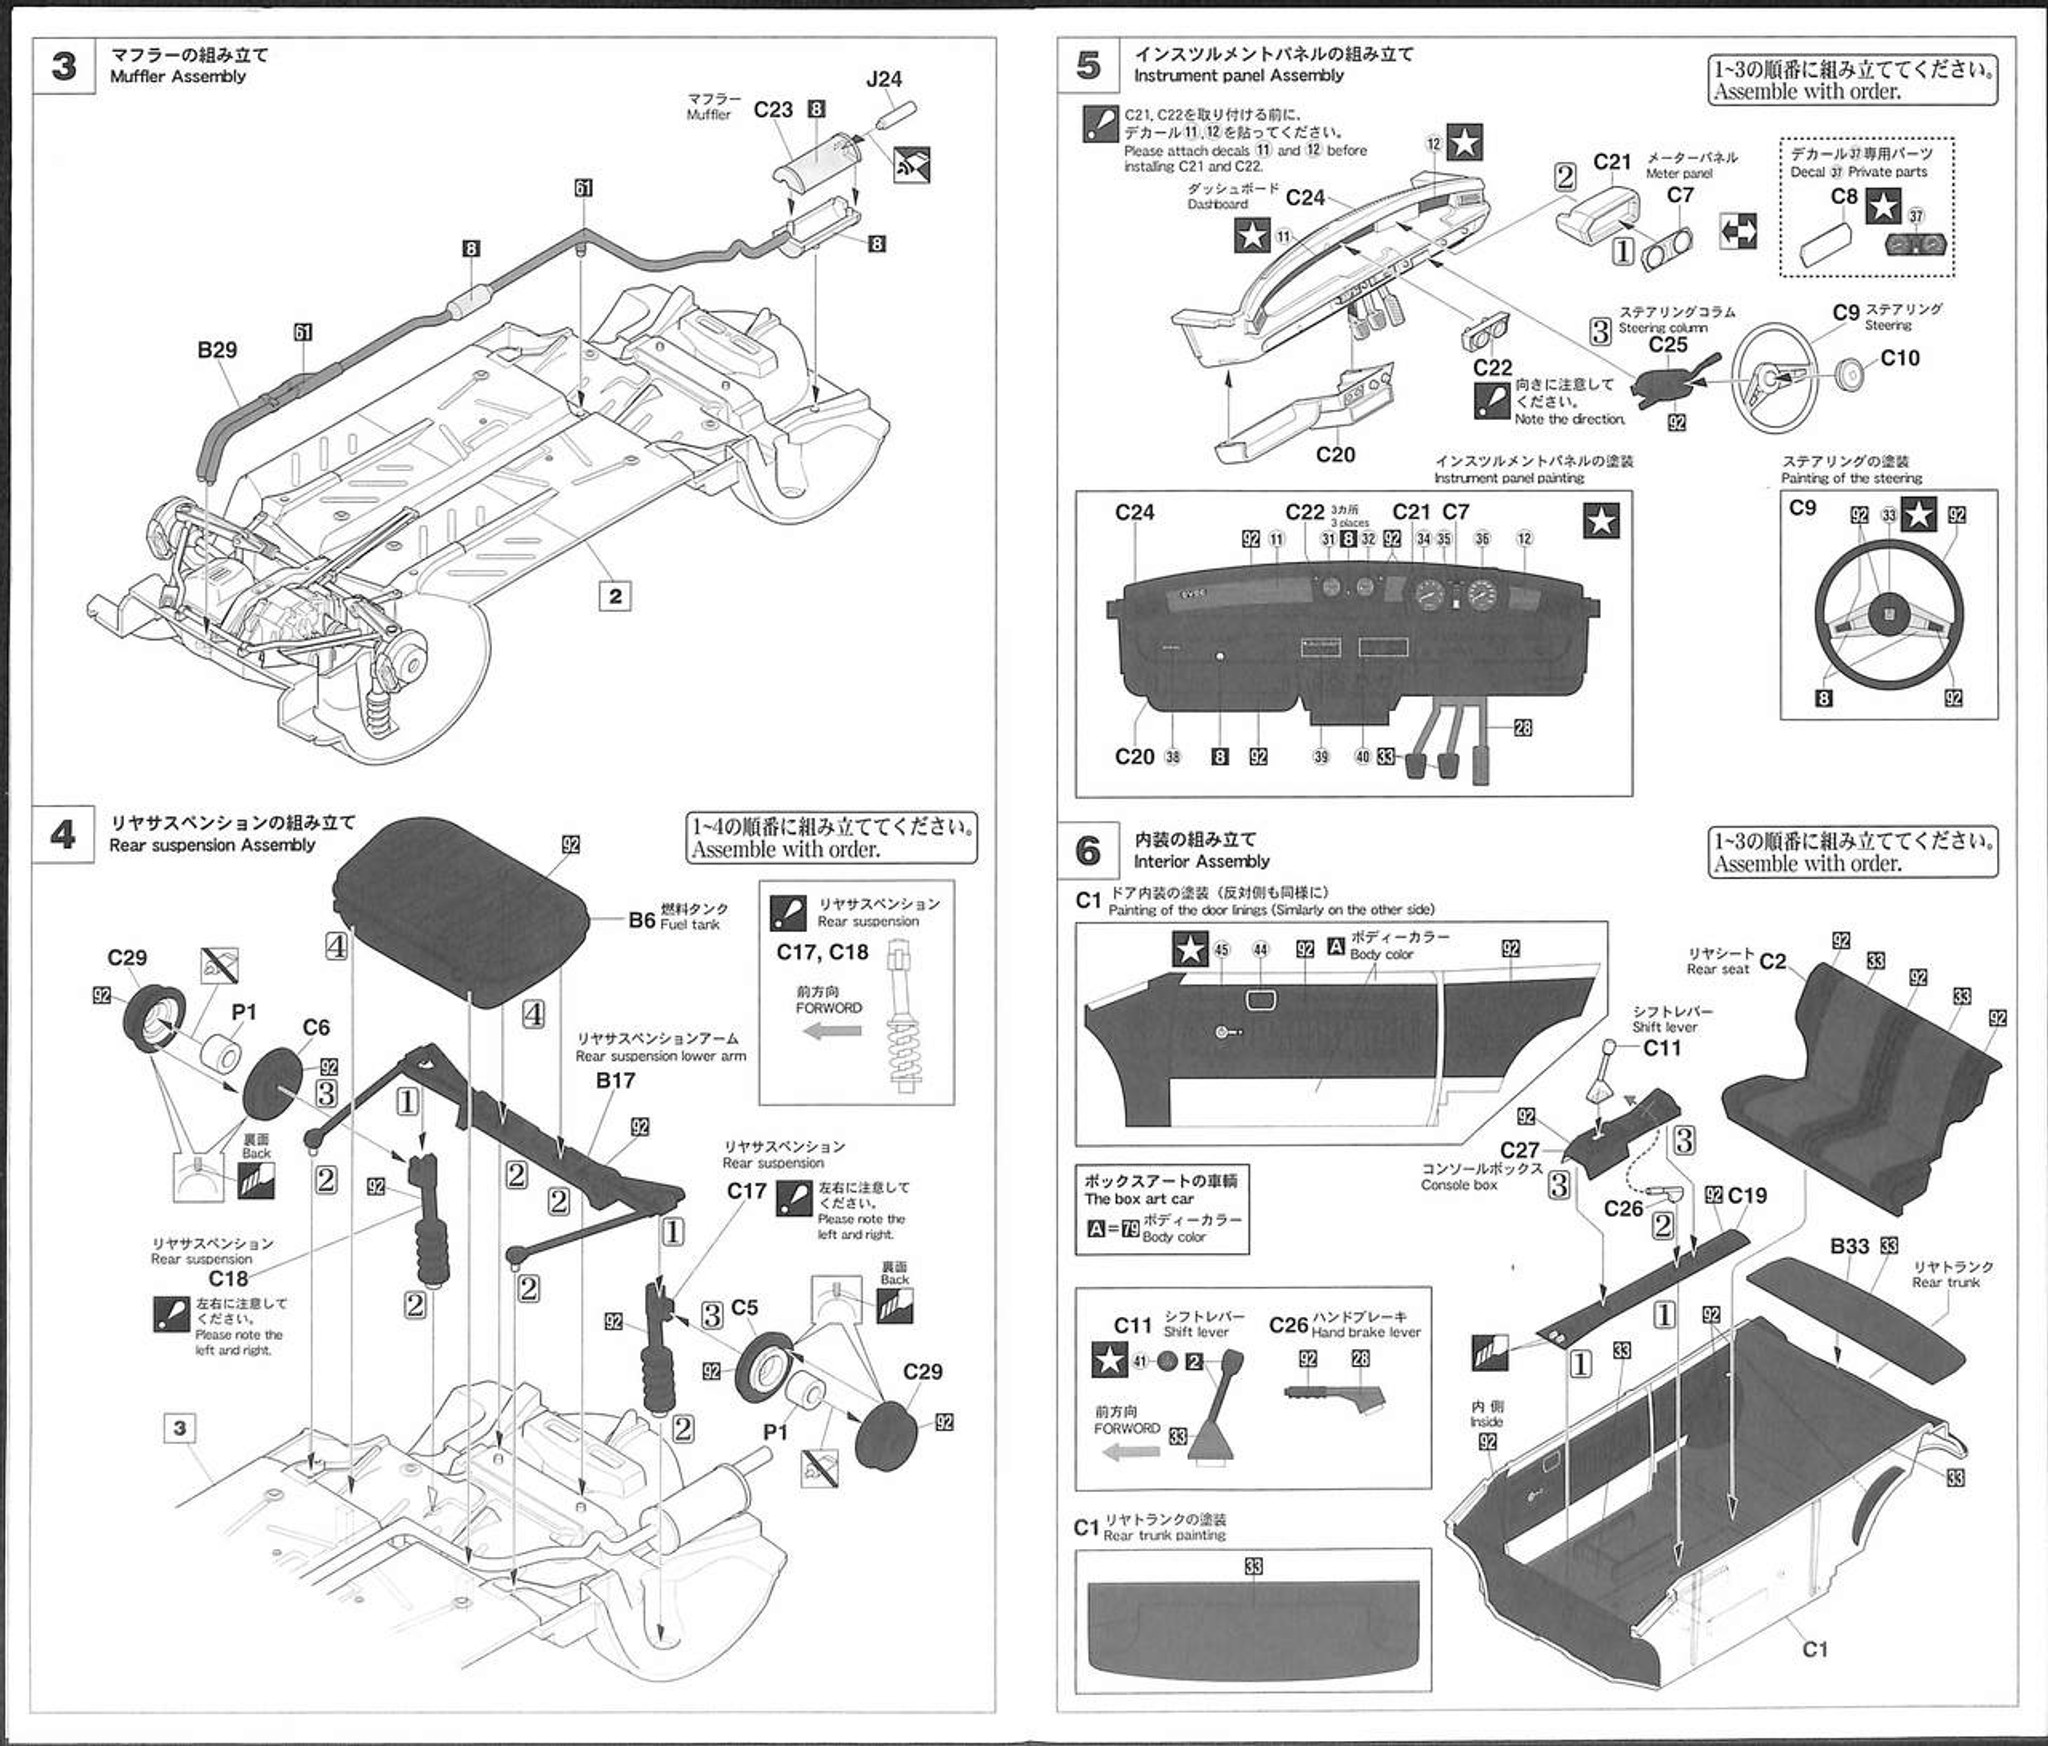 Hasegawa 20360 Honda Civic CVCC GL (SC-1) 2 Door 1/24 Scale kit on